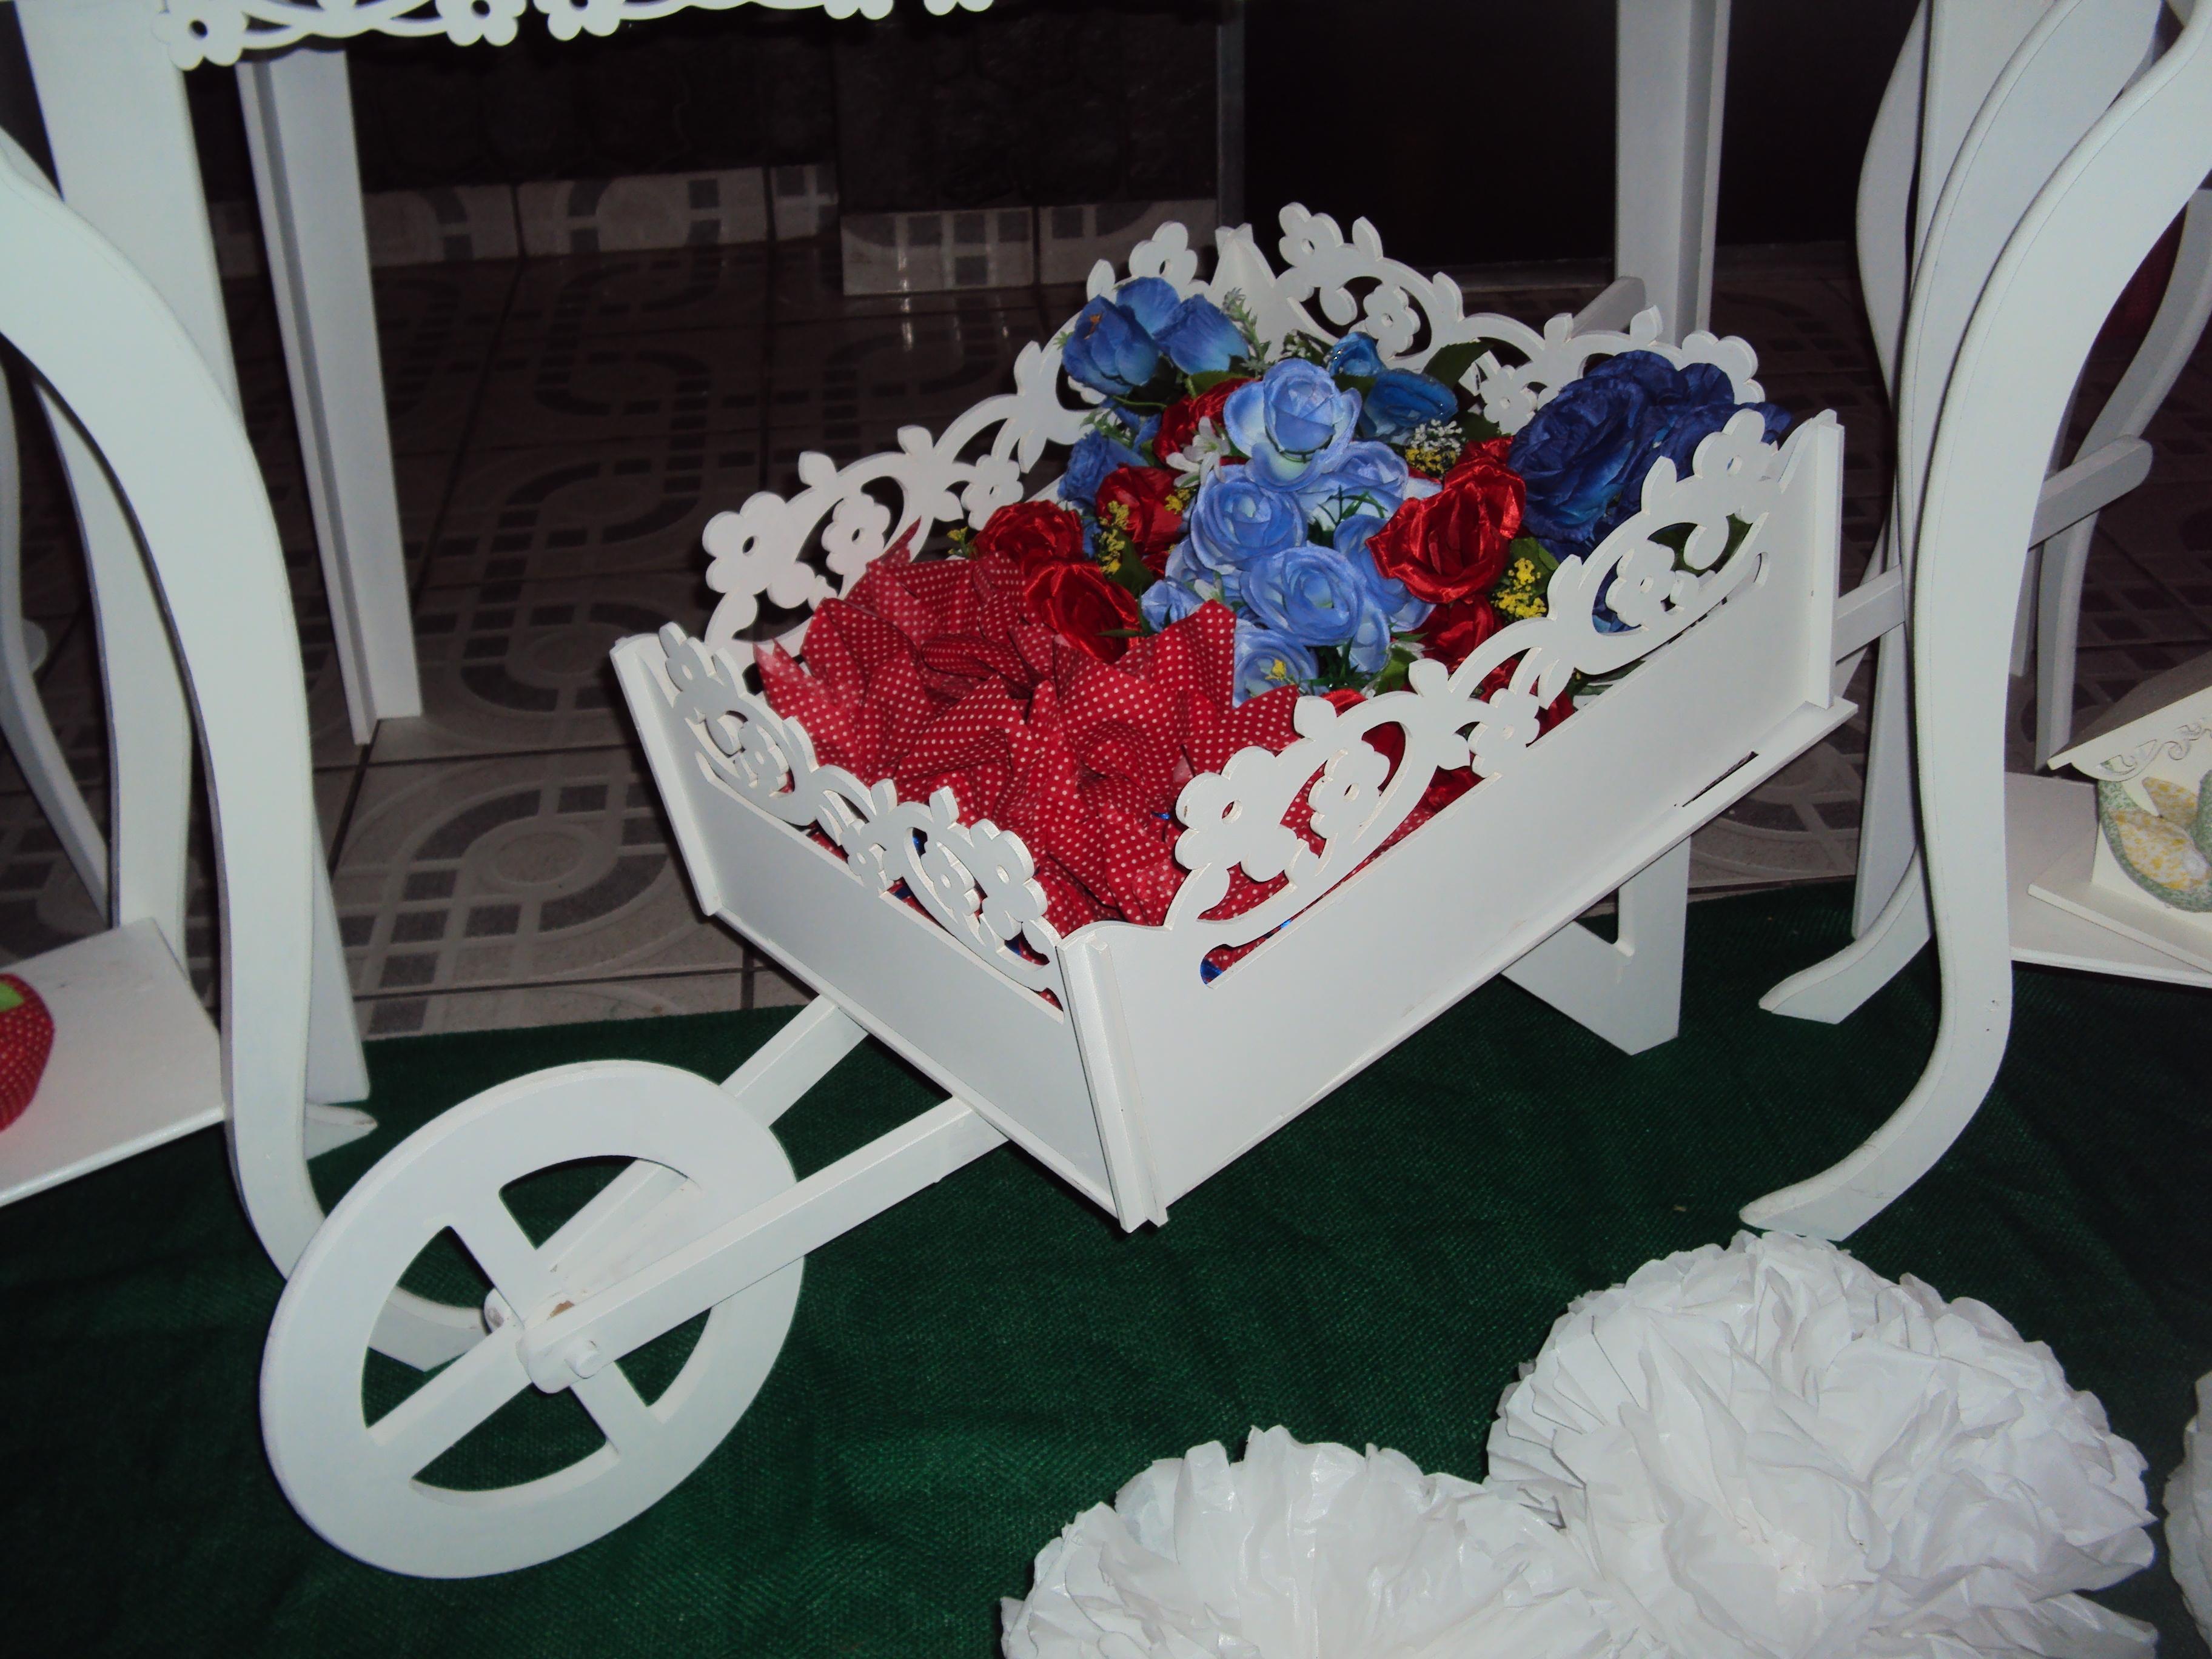 decoracao festa branca de neve provencal: festa-provencal-branca-de-neve decoracao-festa-provencal-branca-de